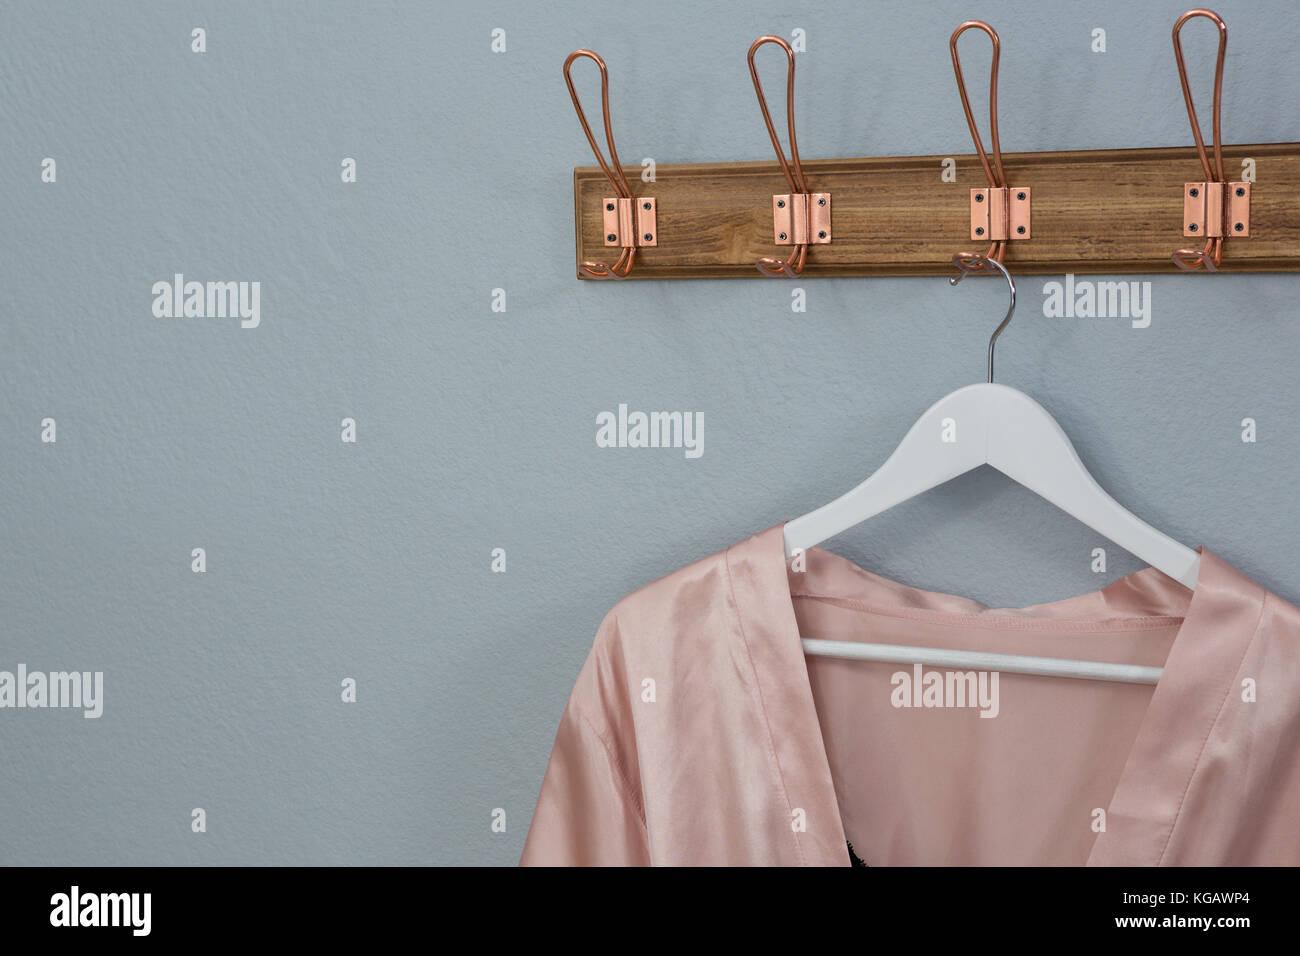 Close-up of nightwear hanging on hook Stock Photo